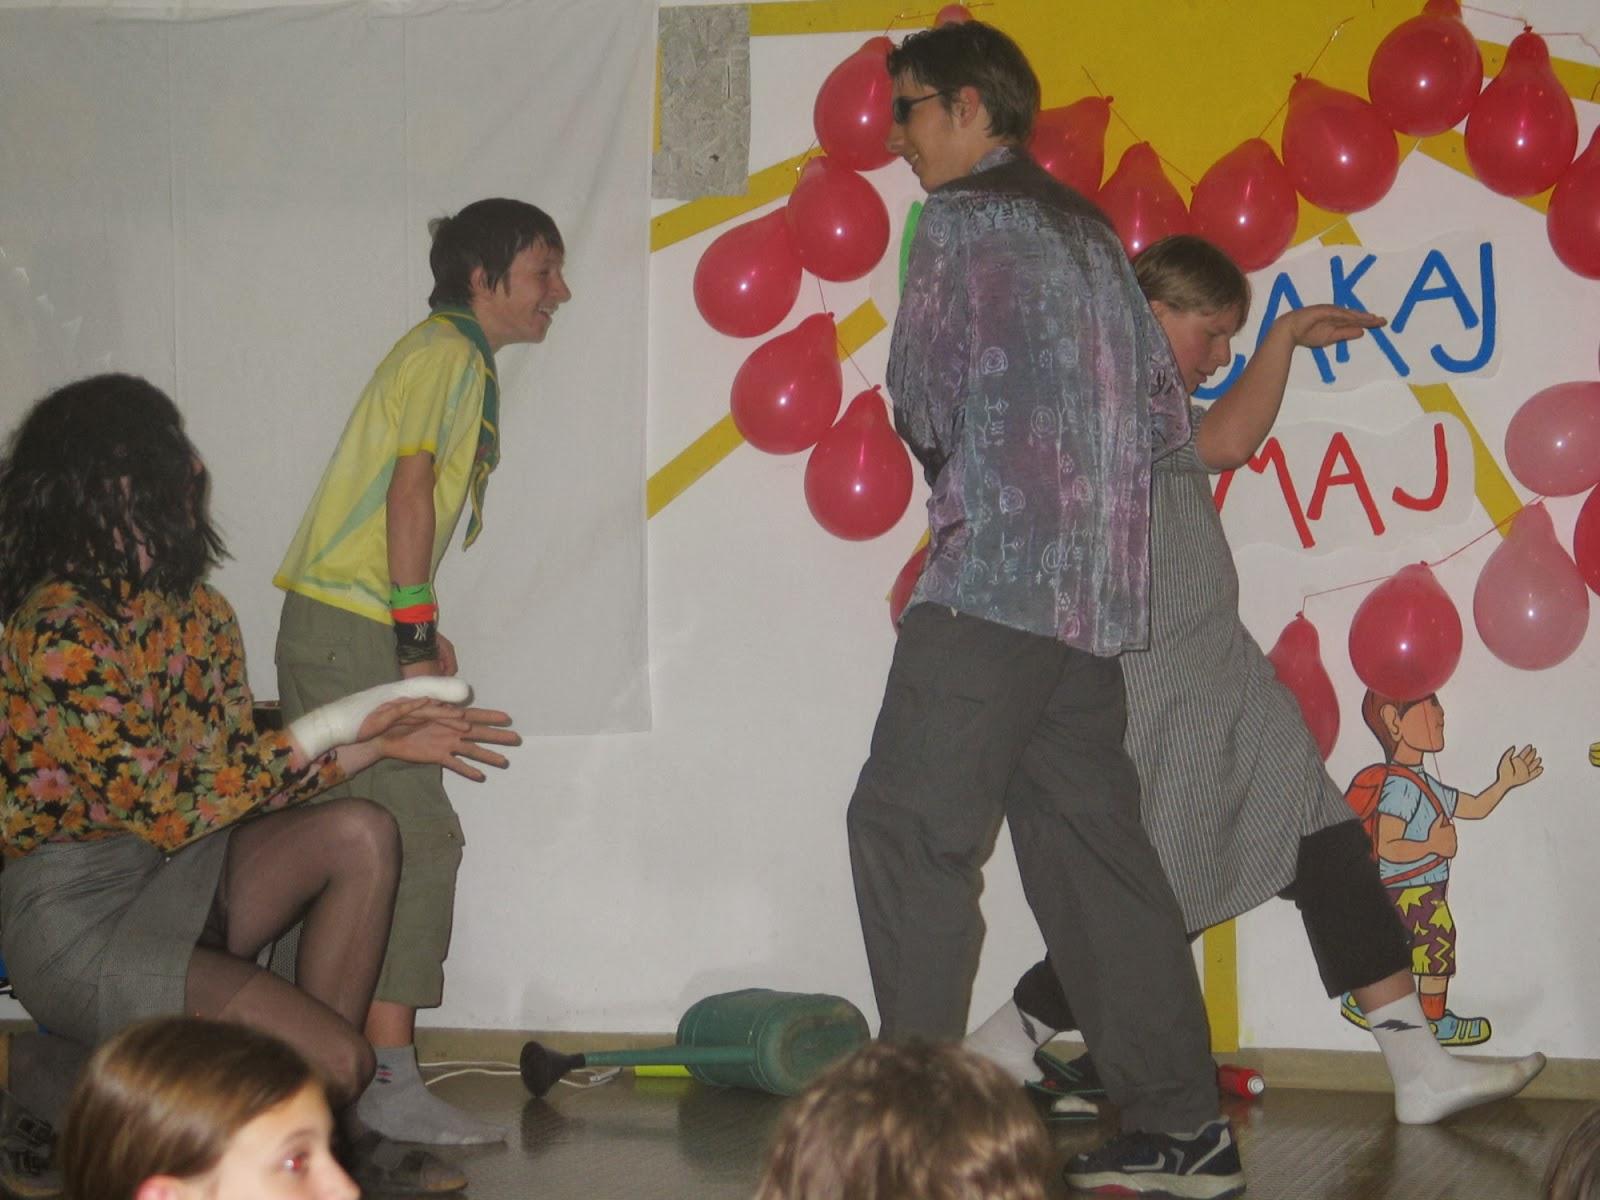 Tabosong, Ilirska Bistrica 2005 - Picture%2B124.jpg